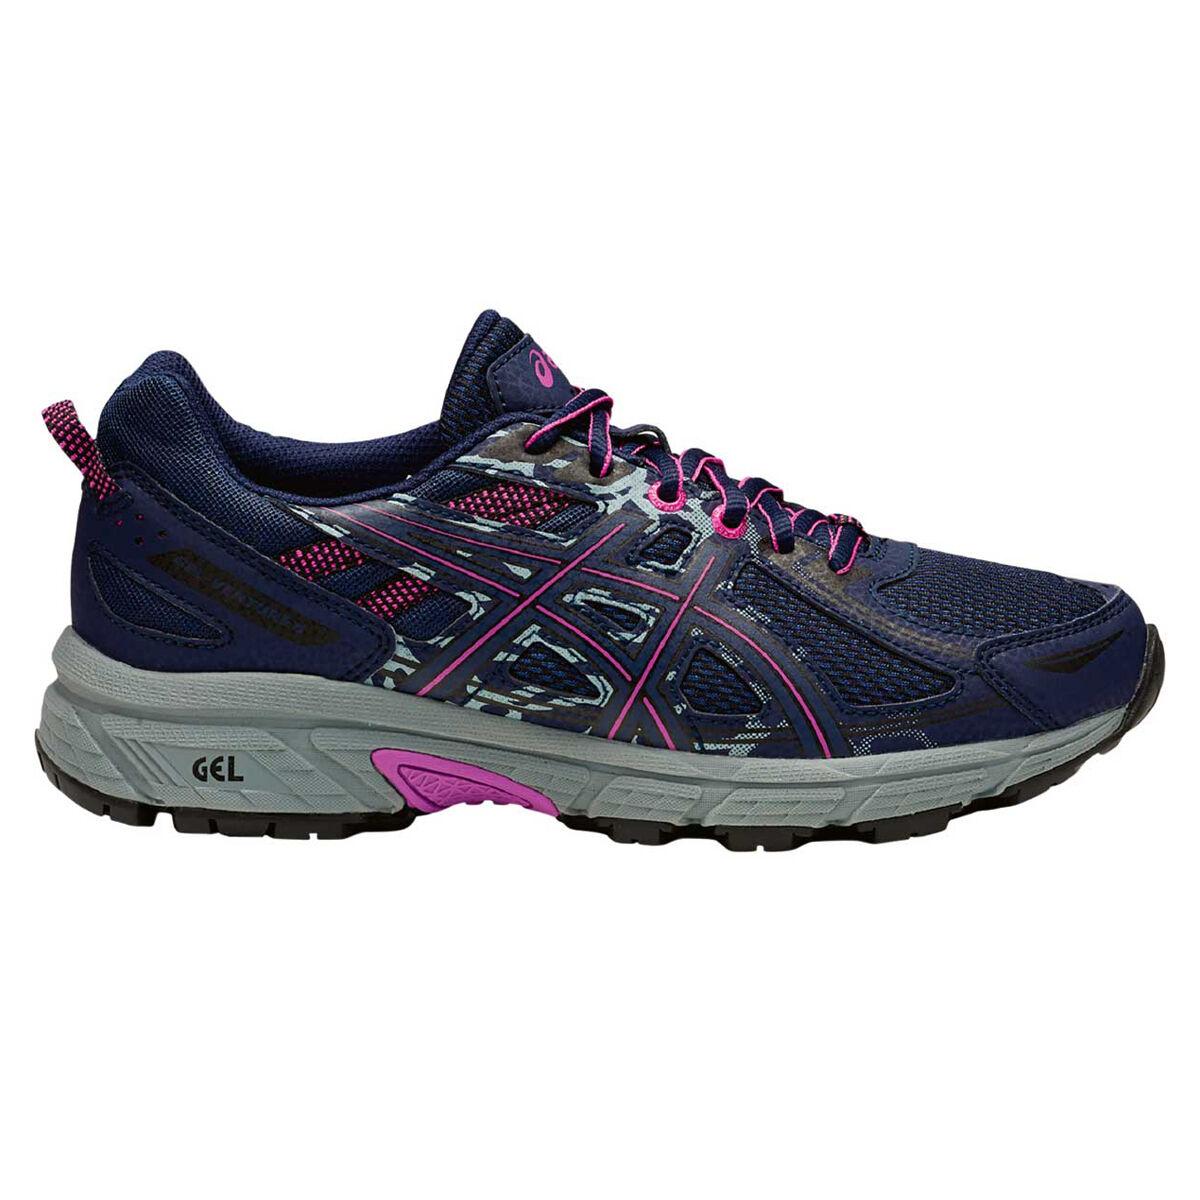 39f895b1dca7 czech nike lunarglide 6 femme b92b5 f6085  best price asics gel venture 6 d  womens trail running shoes black grey us 6 black